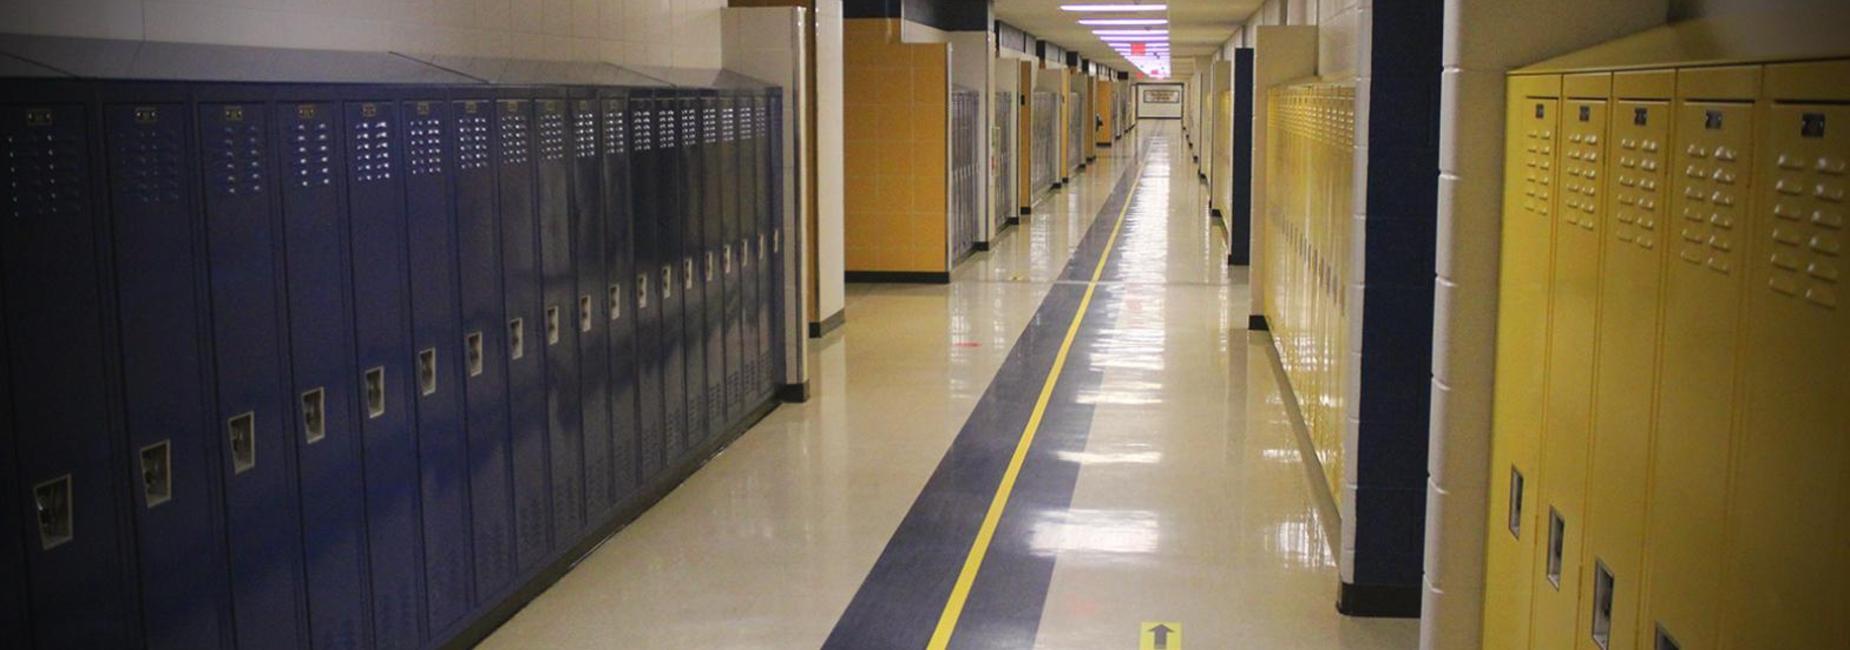 SHCSD Halls of Learning